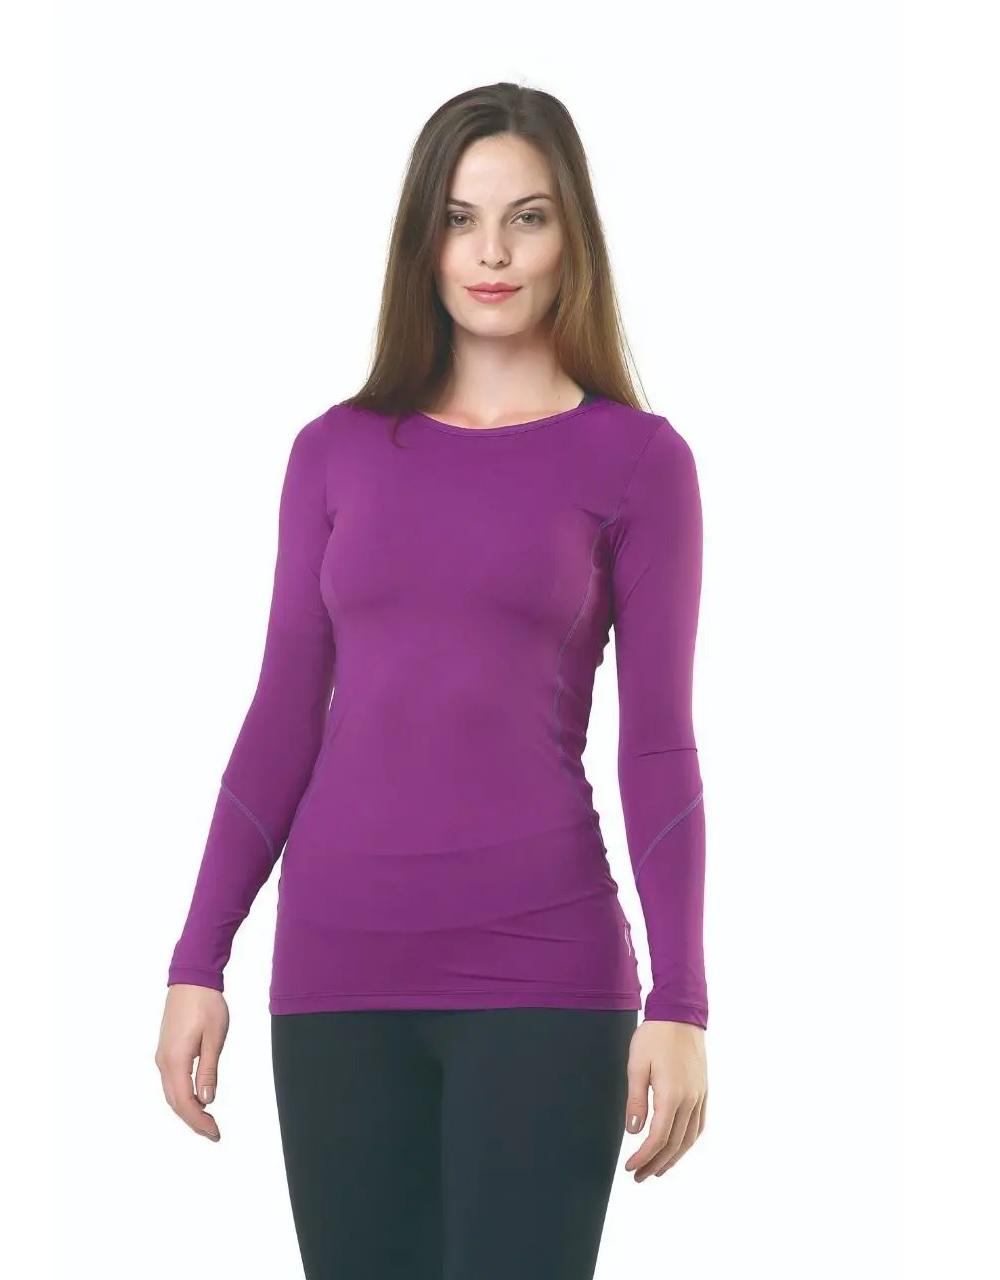 Camisa Elite Woman Fit Térmica com Uv 50 - Elite